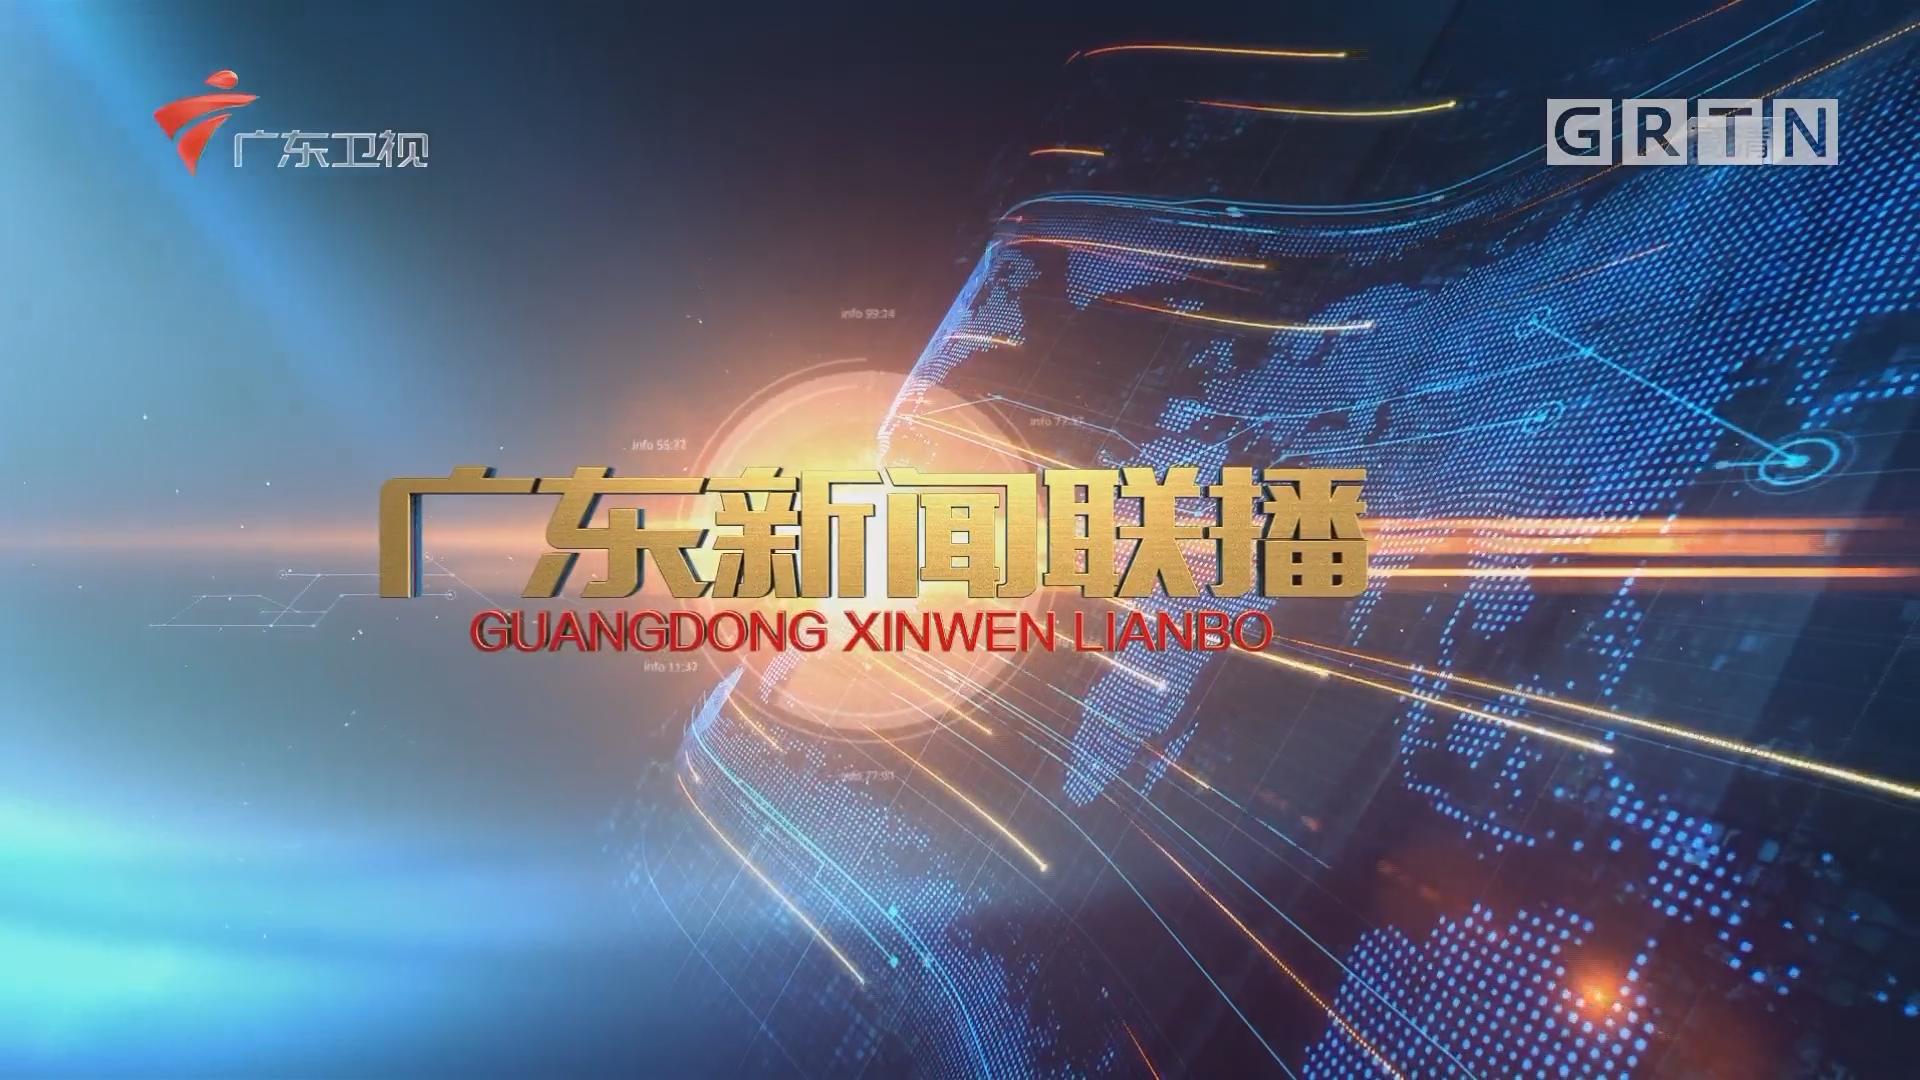 [HD][2018-03-03]广东新闻联播:全国政协十三届一次会议在北京开幕